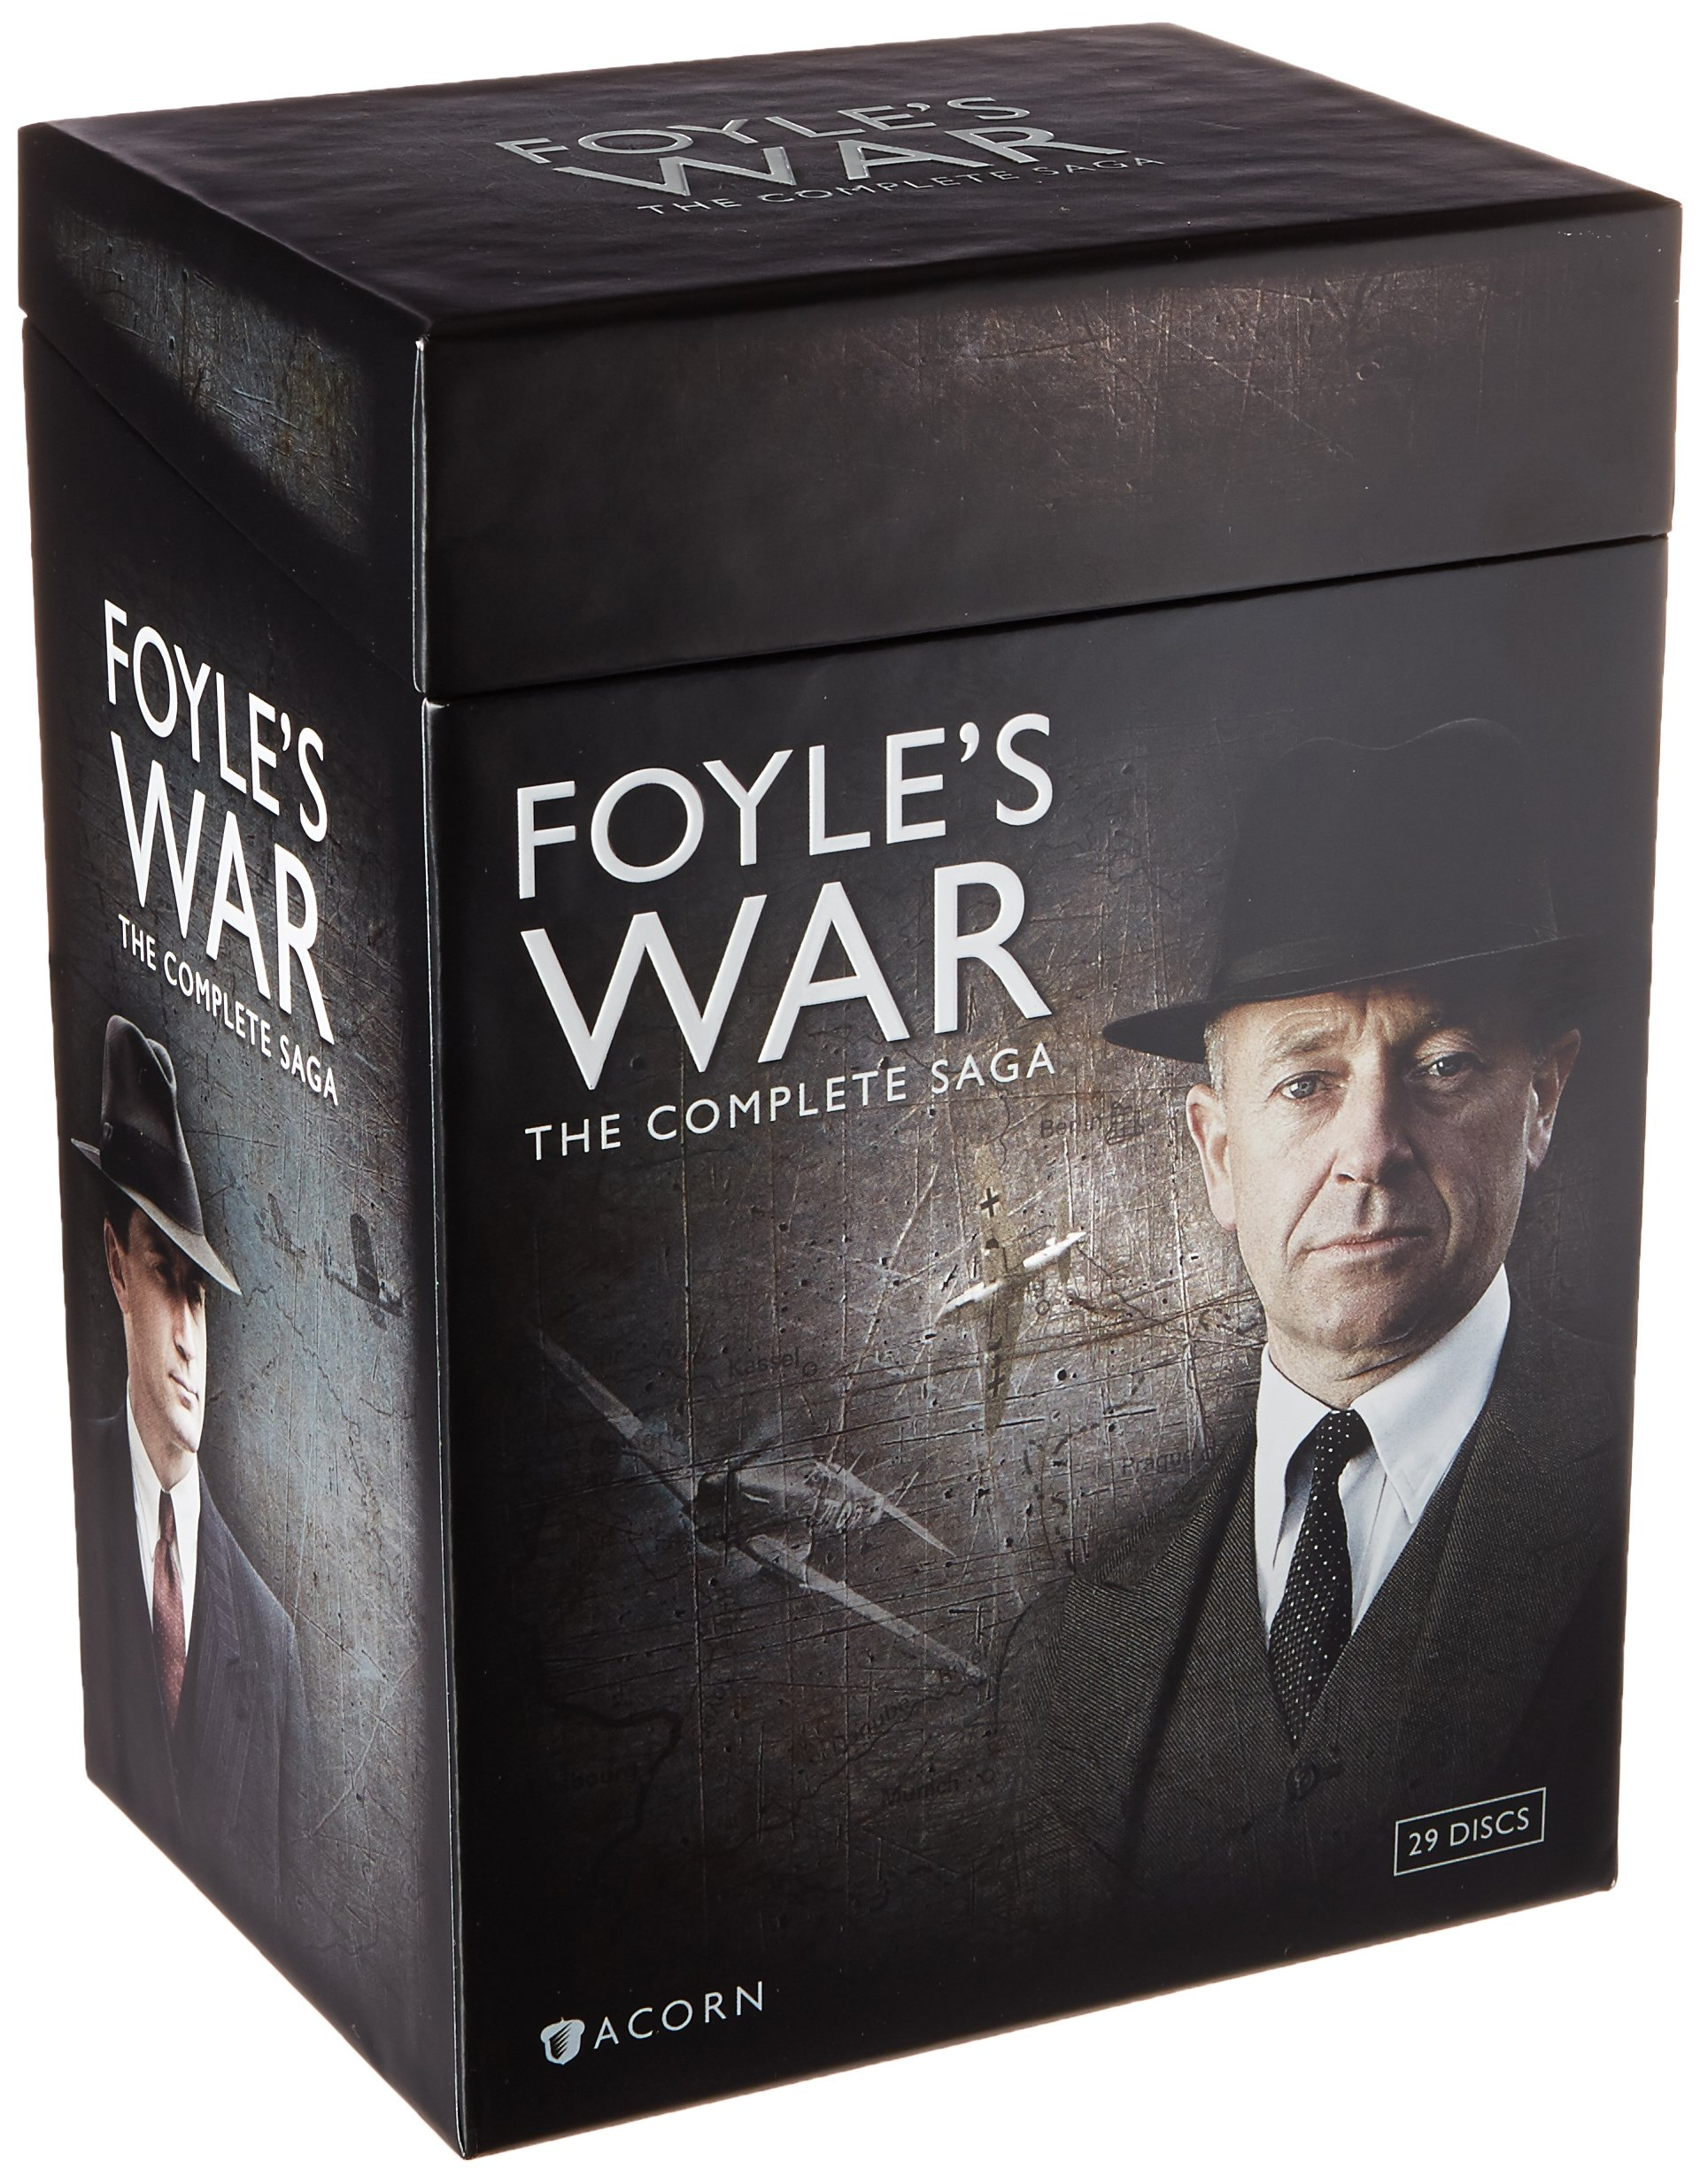 Foyle's War: The Complete Saga by RLJ/SPHE